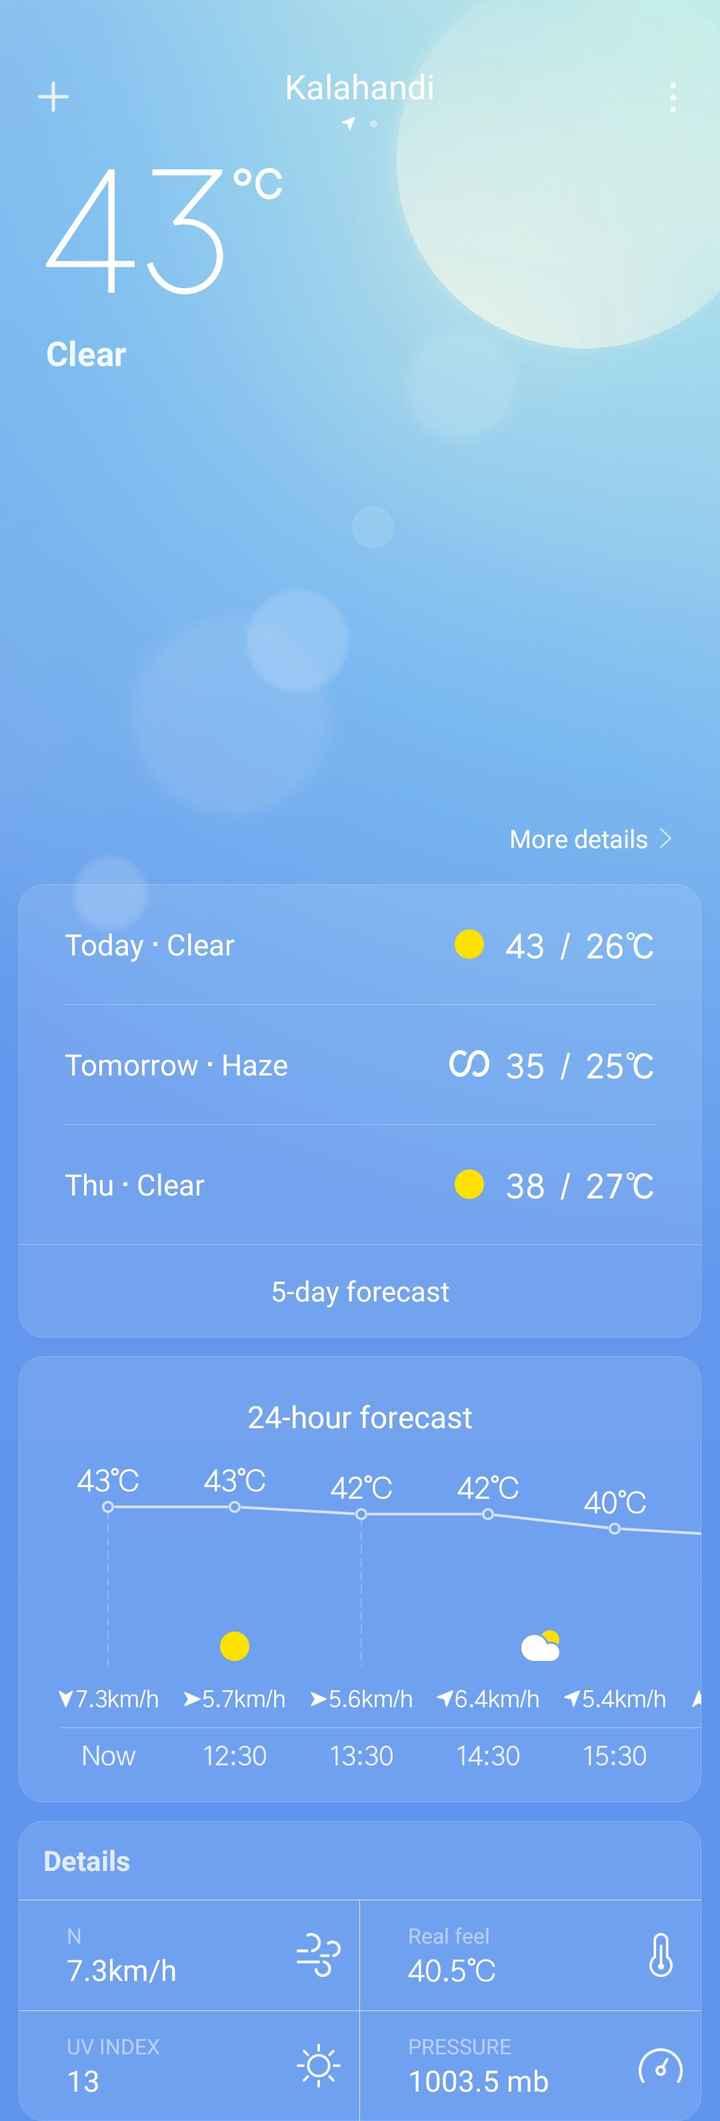 ☂ଖରାଦିନ ସଚେତନତା - Kalahandi Clear More details Today - Clear 43 / 26°C Tomorrow - Haze CS 35 / 25°C Thu - Clear 38 / 27°C 5 - day forecast 24 - hour forecast 43°C 42°C 42°C 43°C 40°C V7 . 3km / h > 5 . 7km / h > 5 . 6km / h 16 . 4km / h 15 . 4km / h 1 Now 12 : 30 13 : 30 14 : 30 15 : 30 Details Real feel 40 . 5°C 7 . 3km / h 7 . 3km / h 1910 3 20 . 500 - 103 . 5 m UV INDEX 13 PRESSURE 1003 . 5 mb - ShareChat